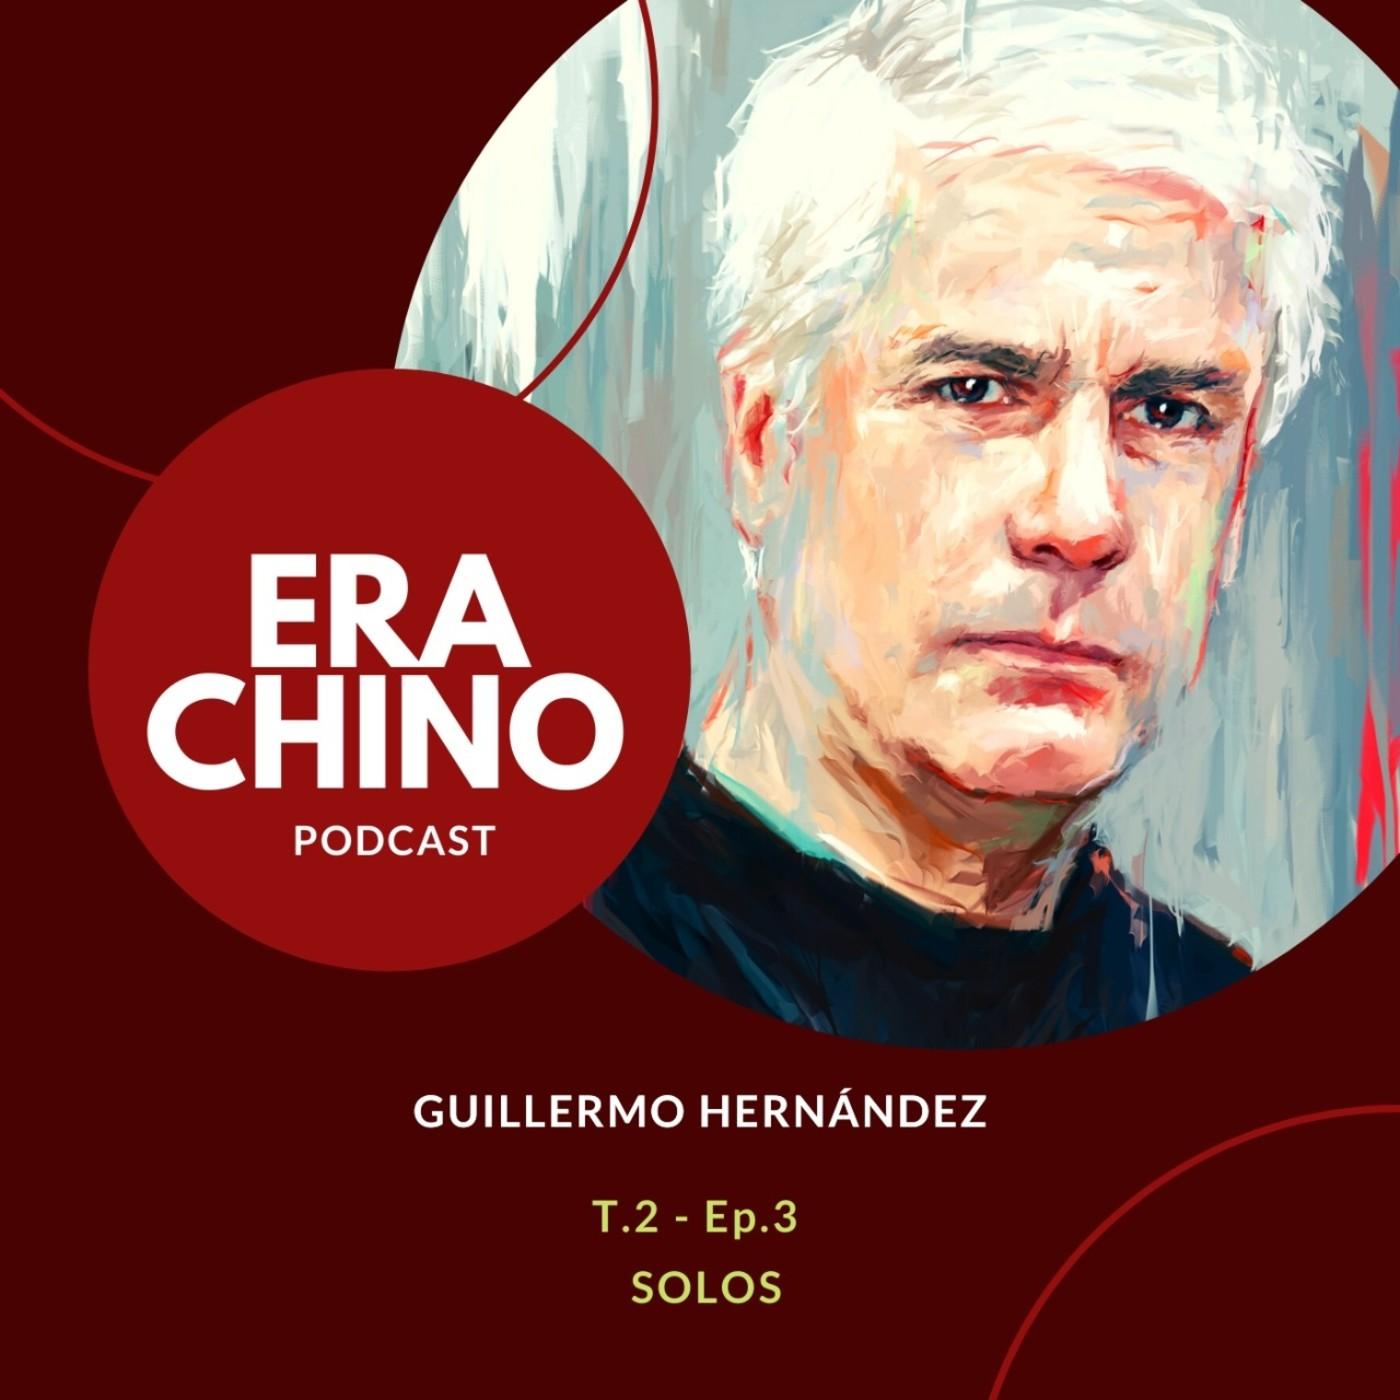 Era Chino T02E03 : Solos